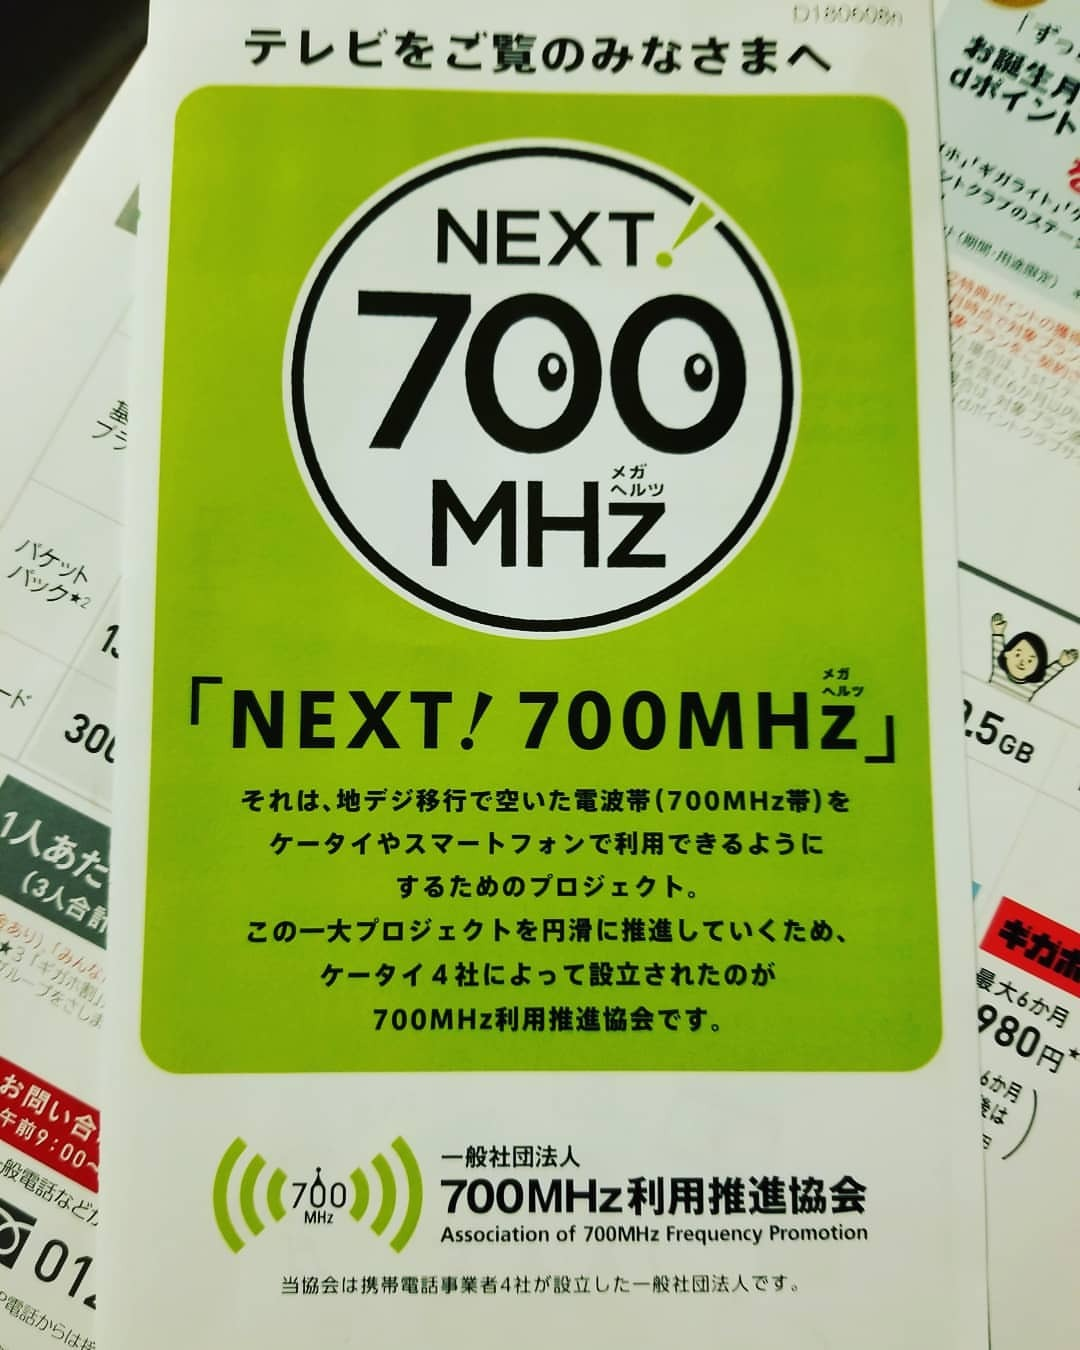 700MHz帯の携帯利用でテレビに障害が発生するかも的な文書が届いてた。まあ、ウチは関係ないけども。https://www.instagram.com/p/ByNAV4GAgP8/?igshid=7l2yjegww9ex